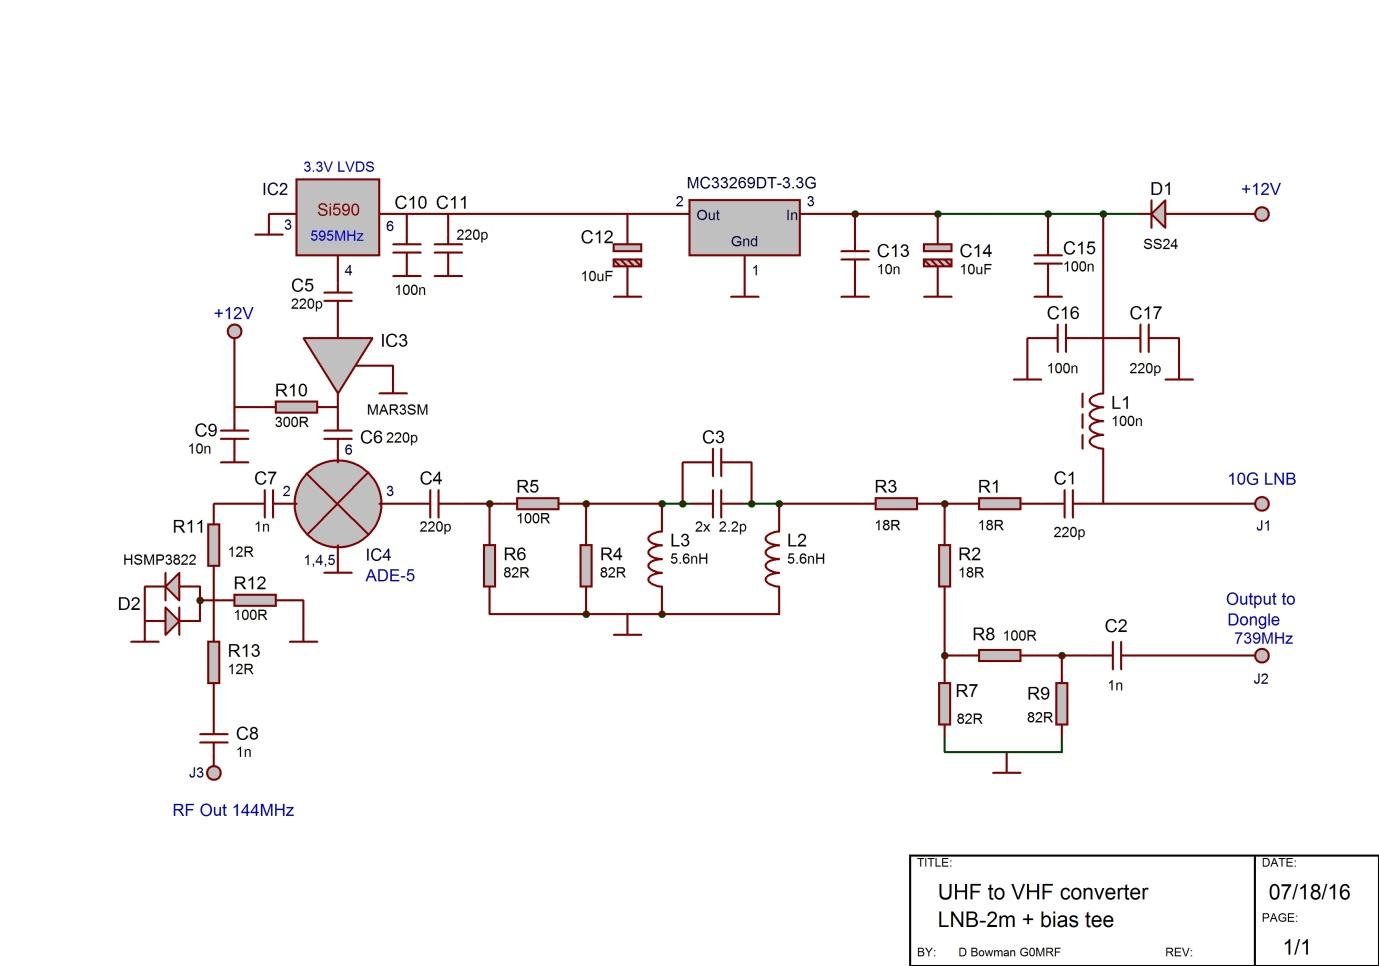 Stupendous Lnb Wiring Diagram Wiring Diagram B7 Wiring Cloud Eachirenstrafr09Org